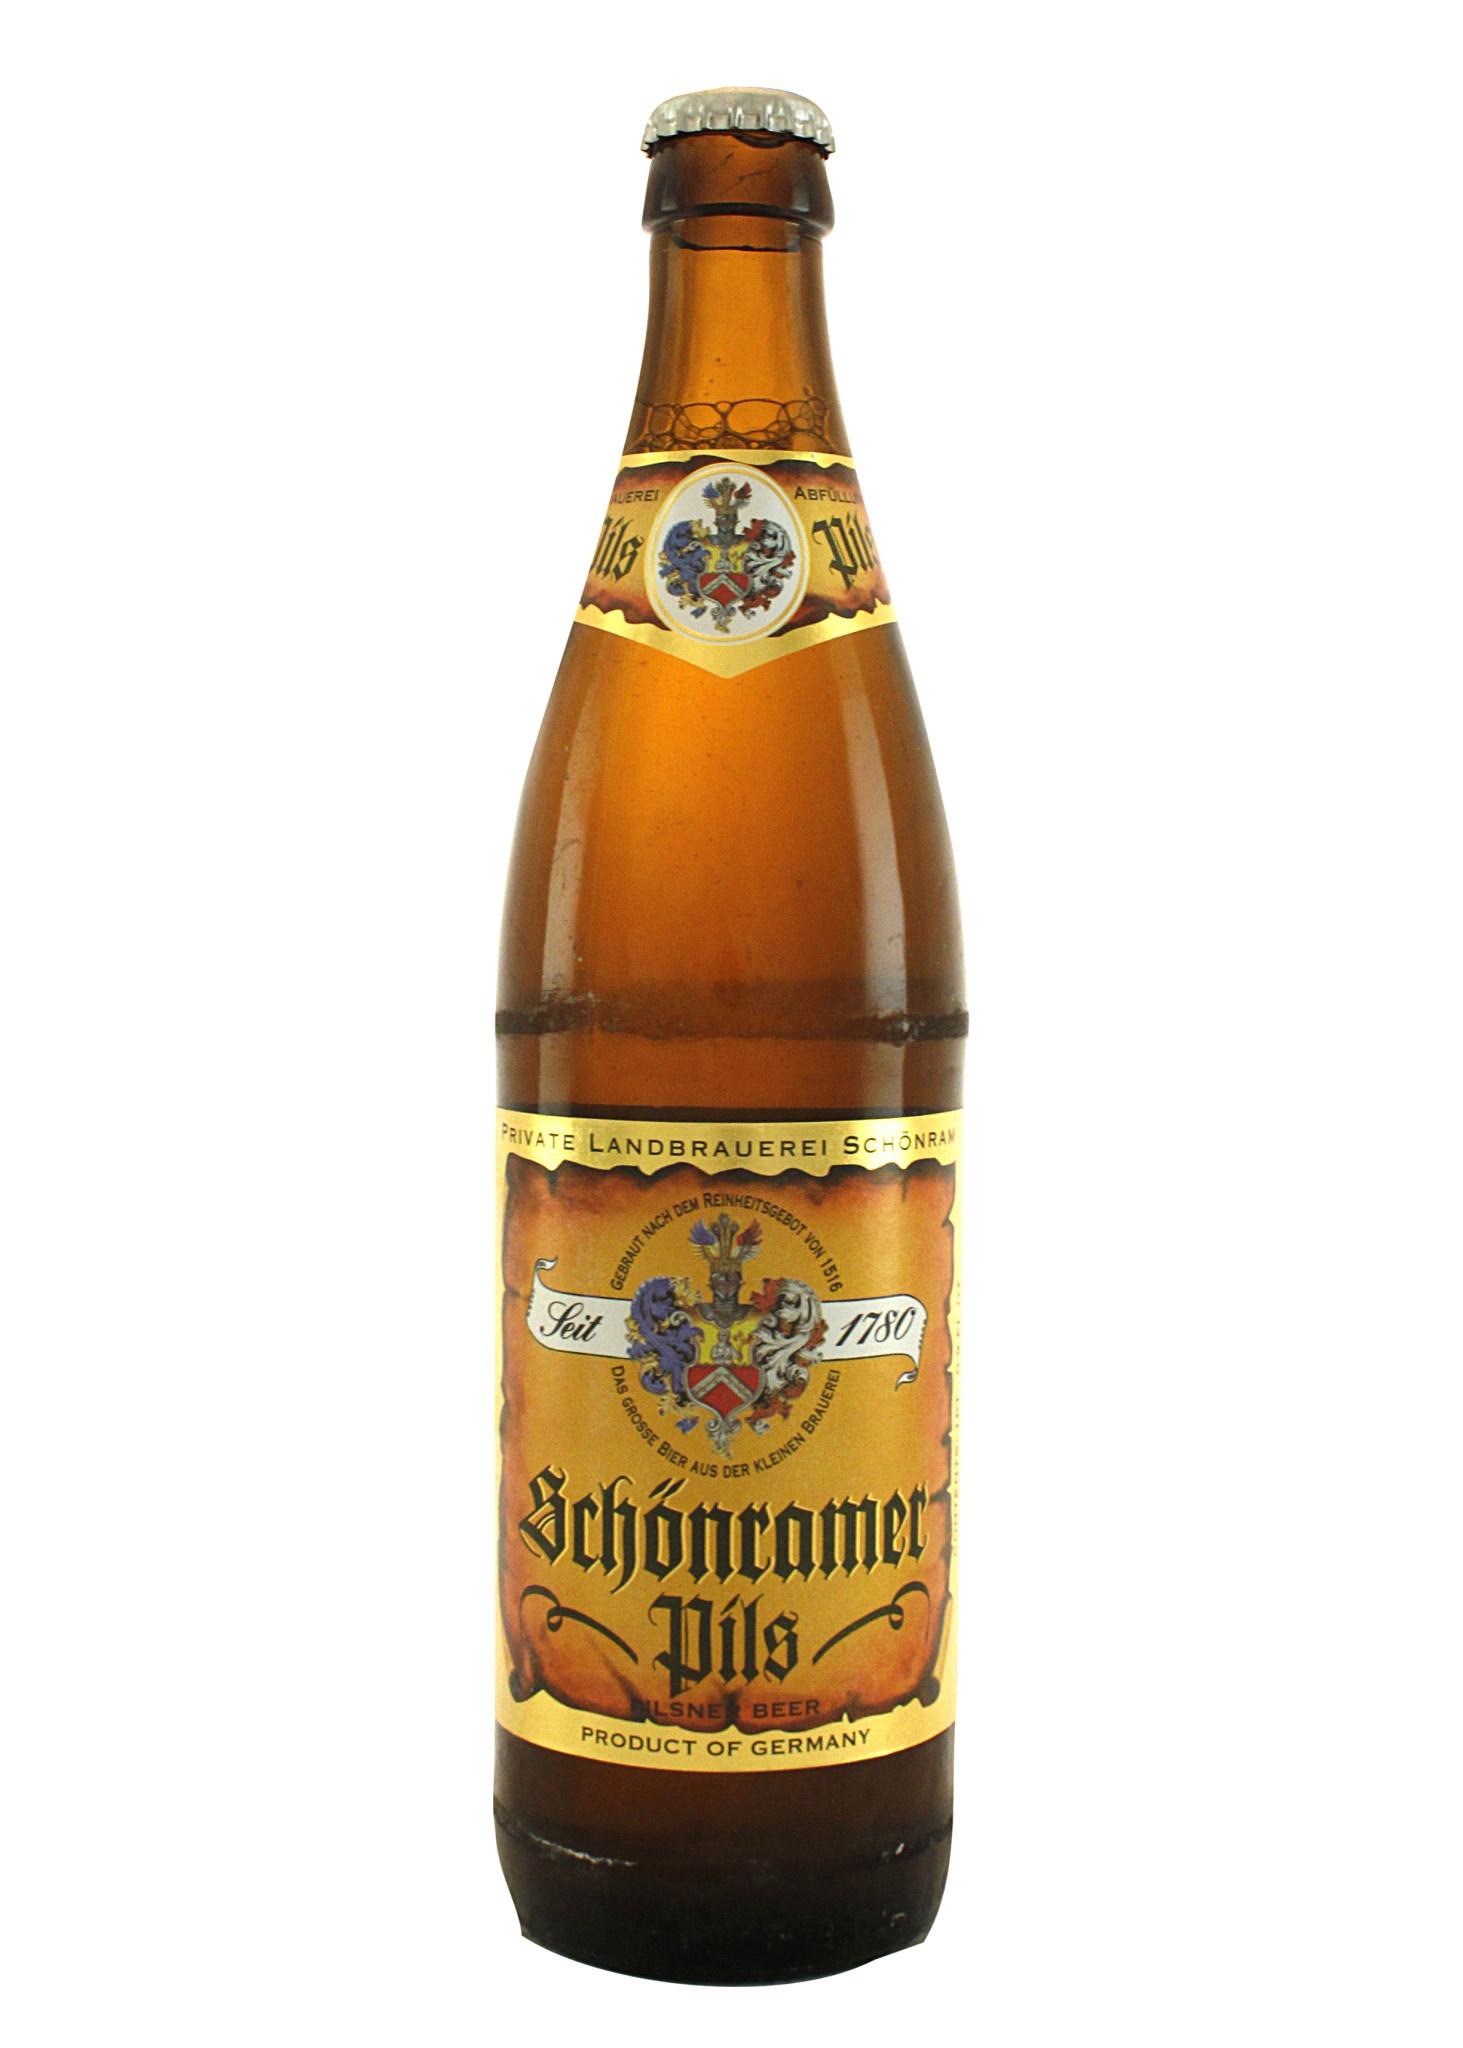 Schonramer PIls, Germany, 500ml. bottle